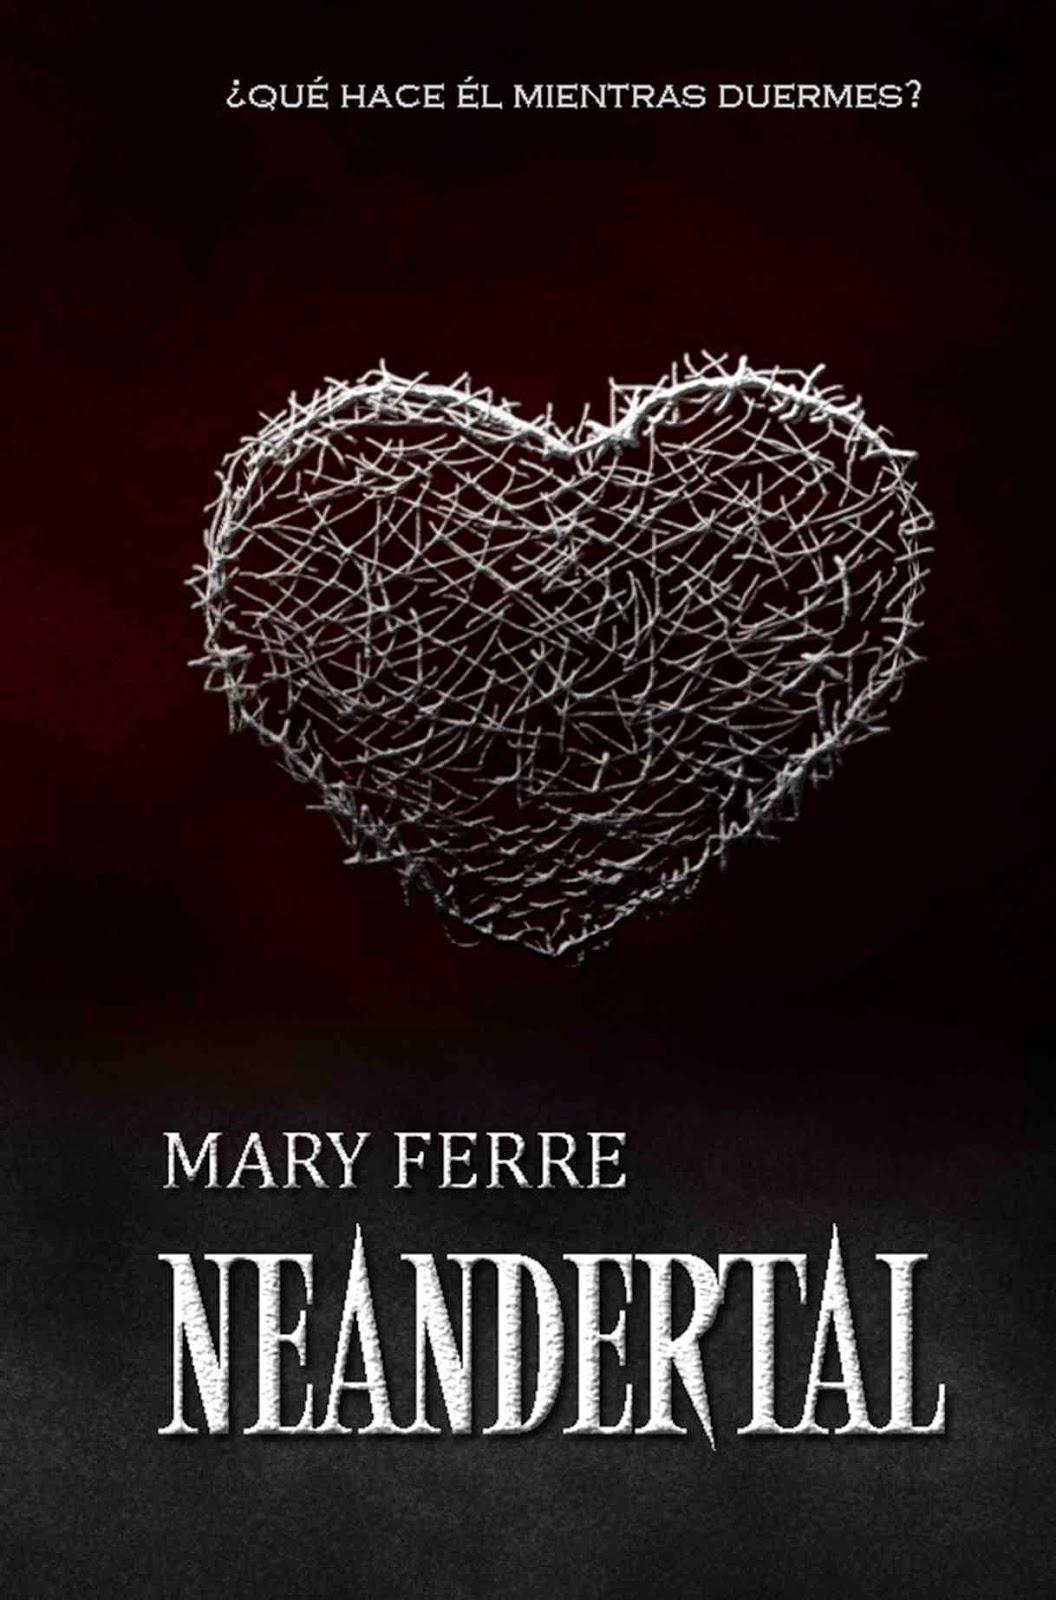 Mary Ferre Saga Neandertal Cover